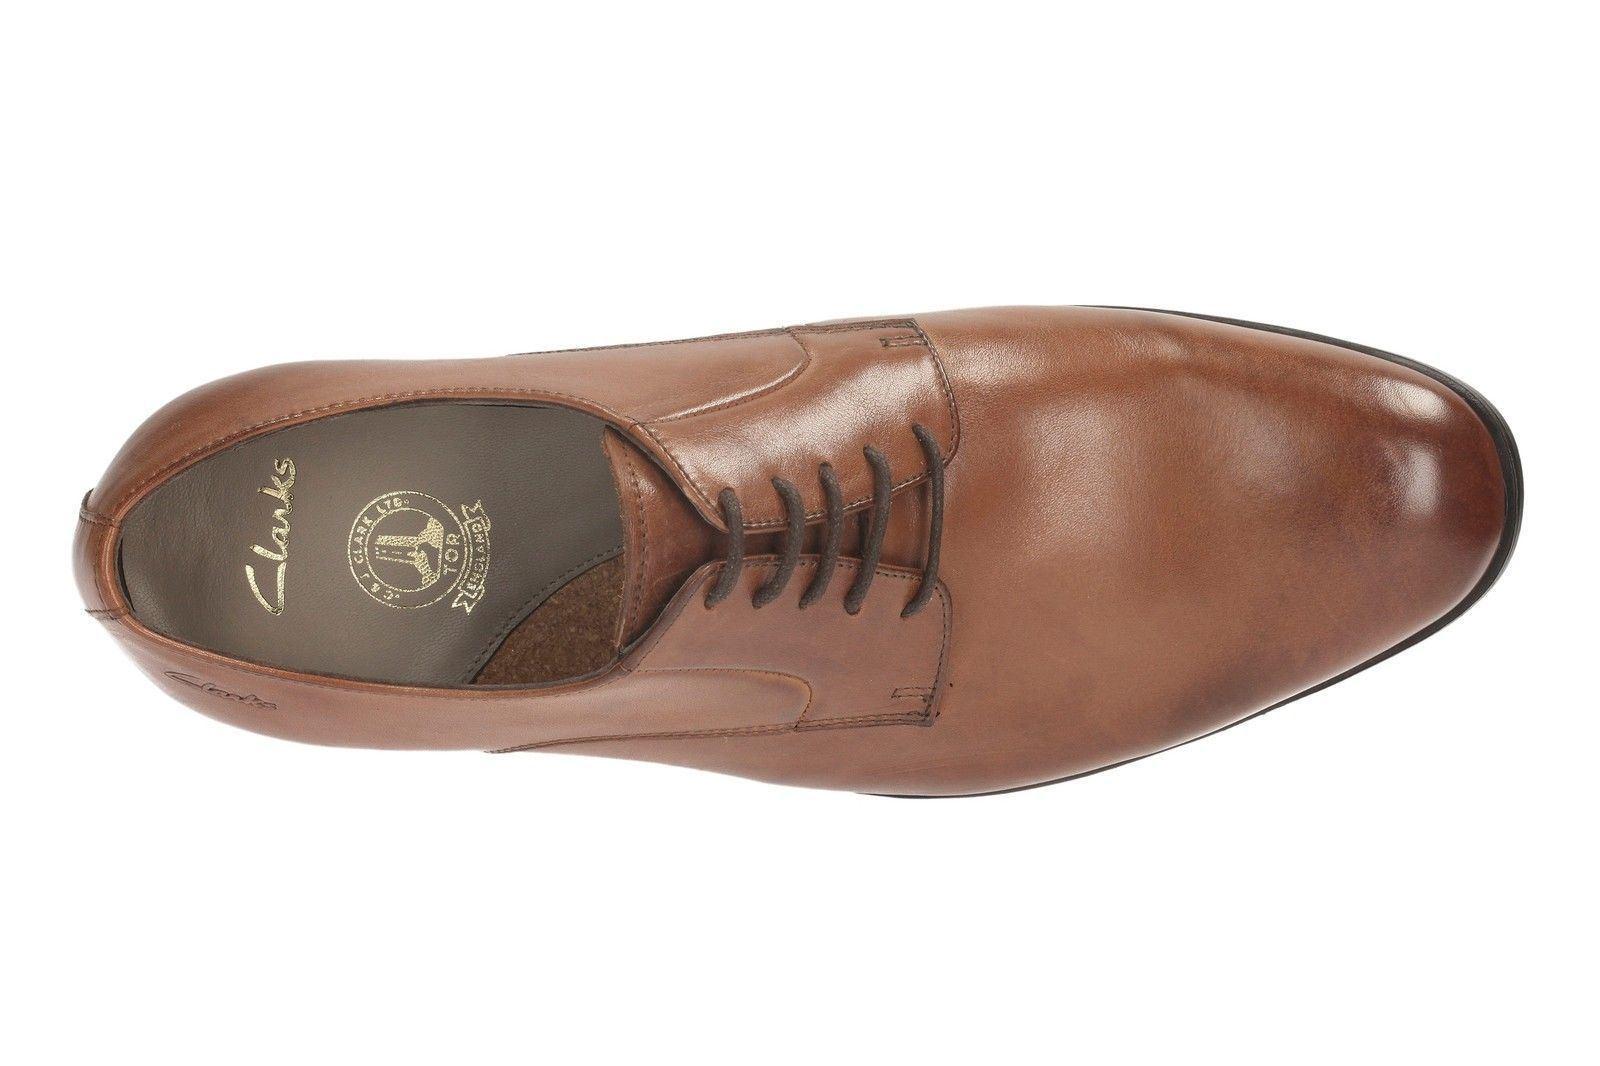 Men's Formal Clarks Lace Up Leather Formal Men's Shoes Banfield Walk ed0589